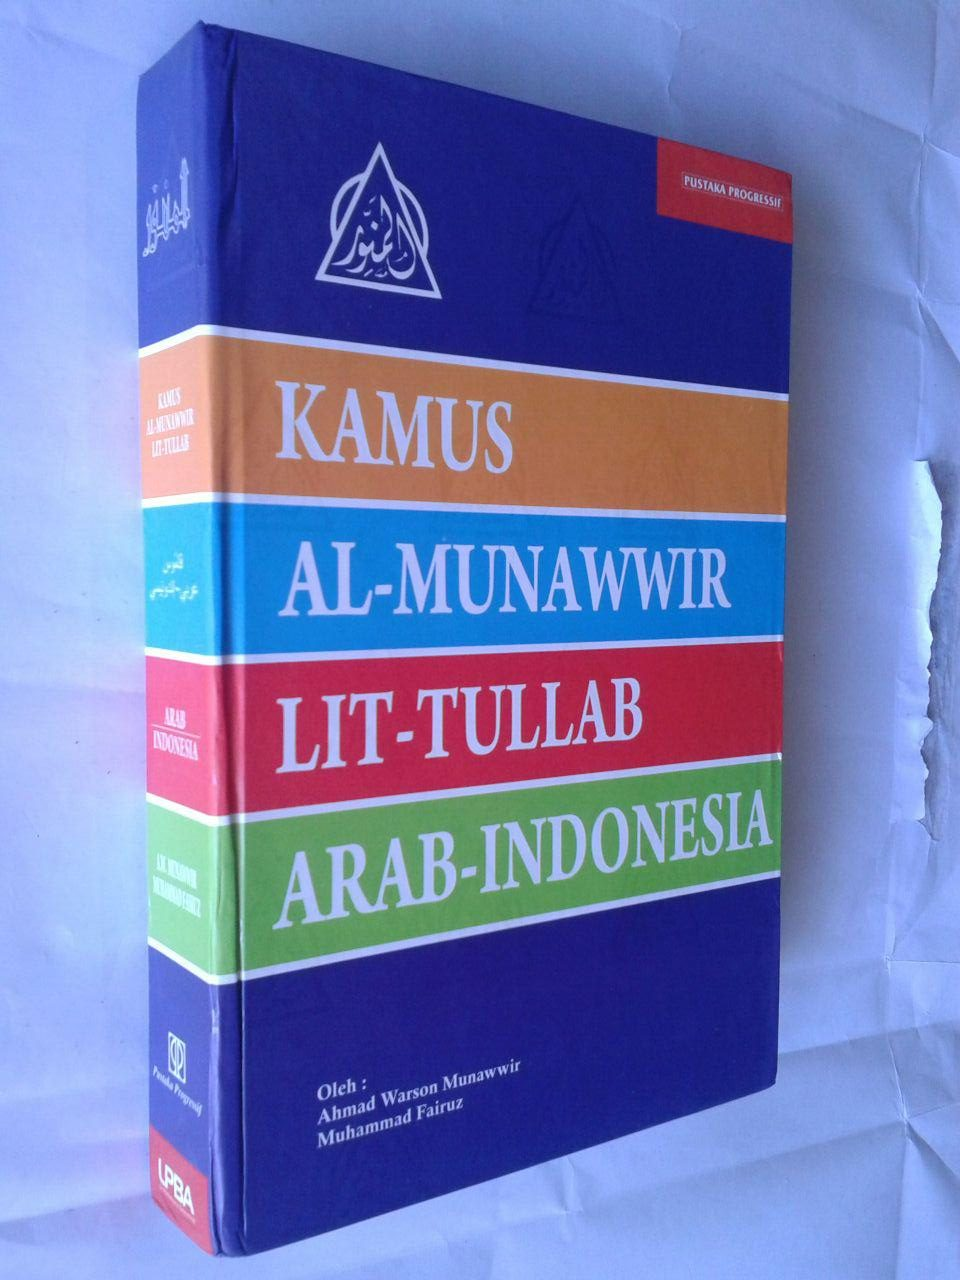 Buku Kamus Al-Munawwir Lit-Tullab Arab-Indonesia cover